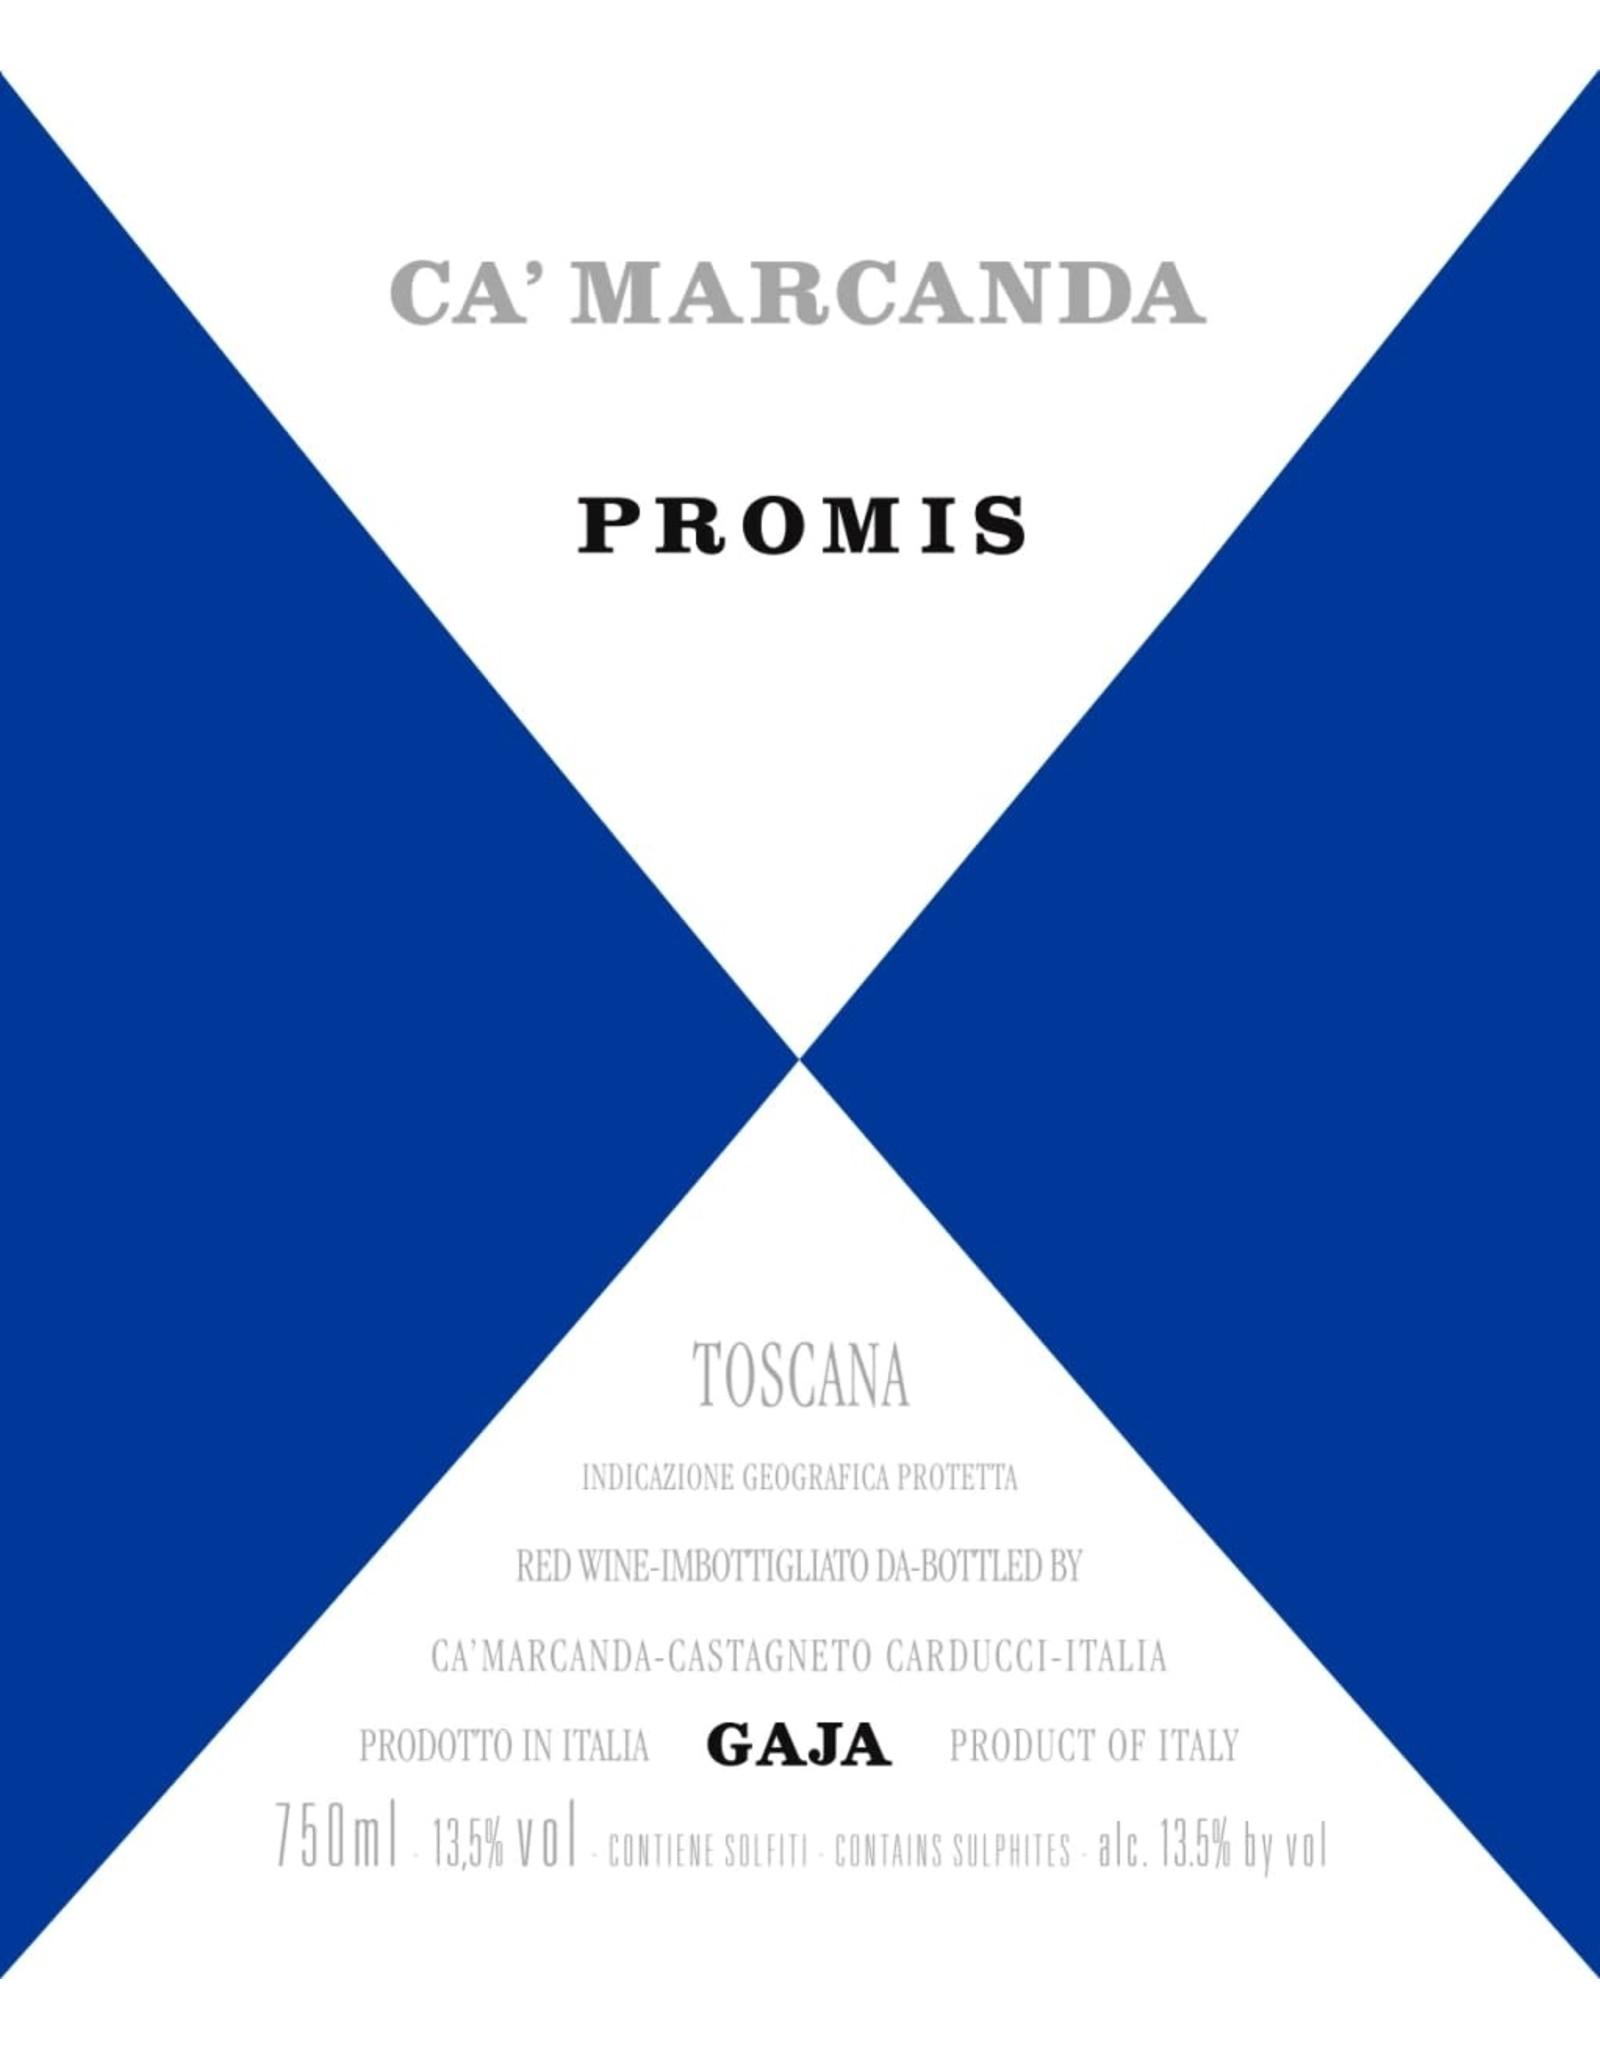 Gaja Gaja Ca' Marcanda Promis Toscana 2018